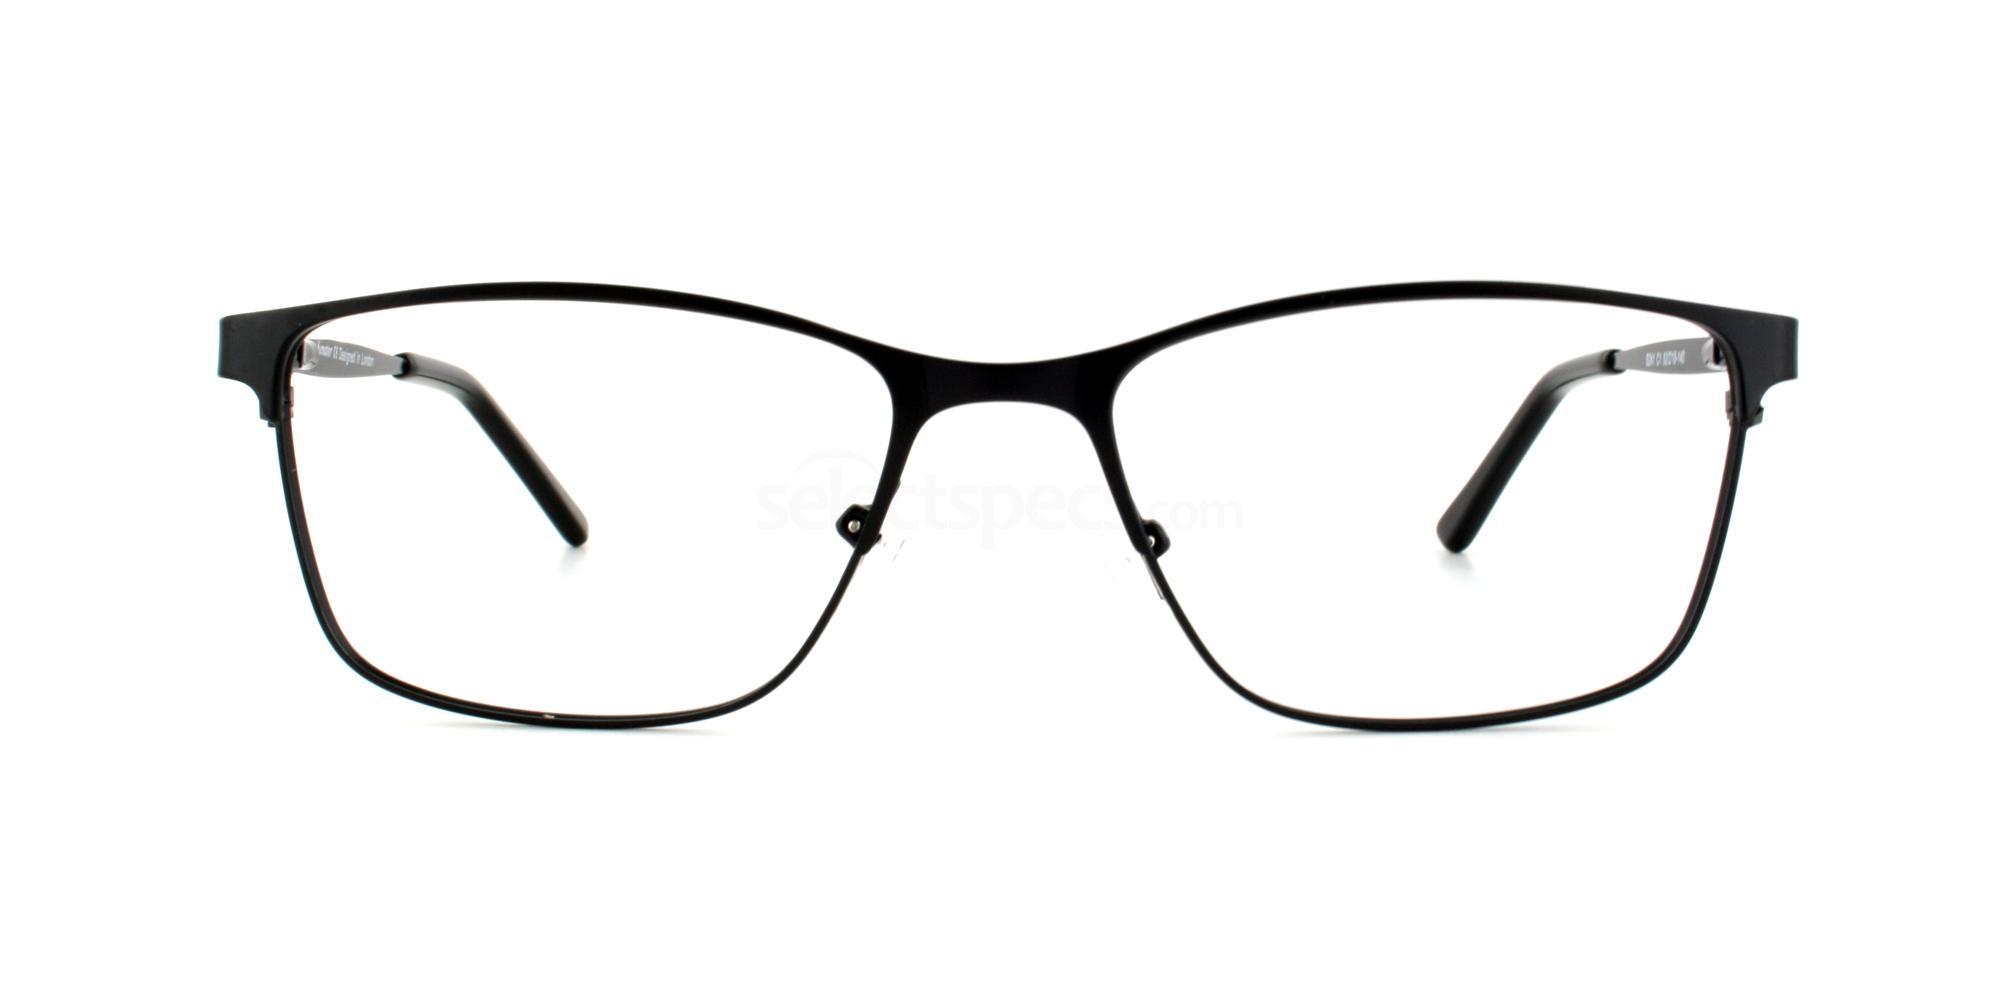 C1 SENATOR 241 Glasses, Senator